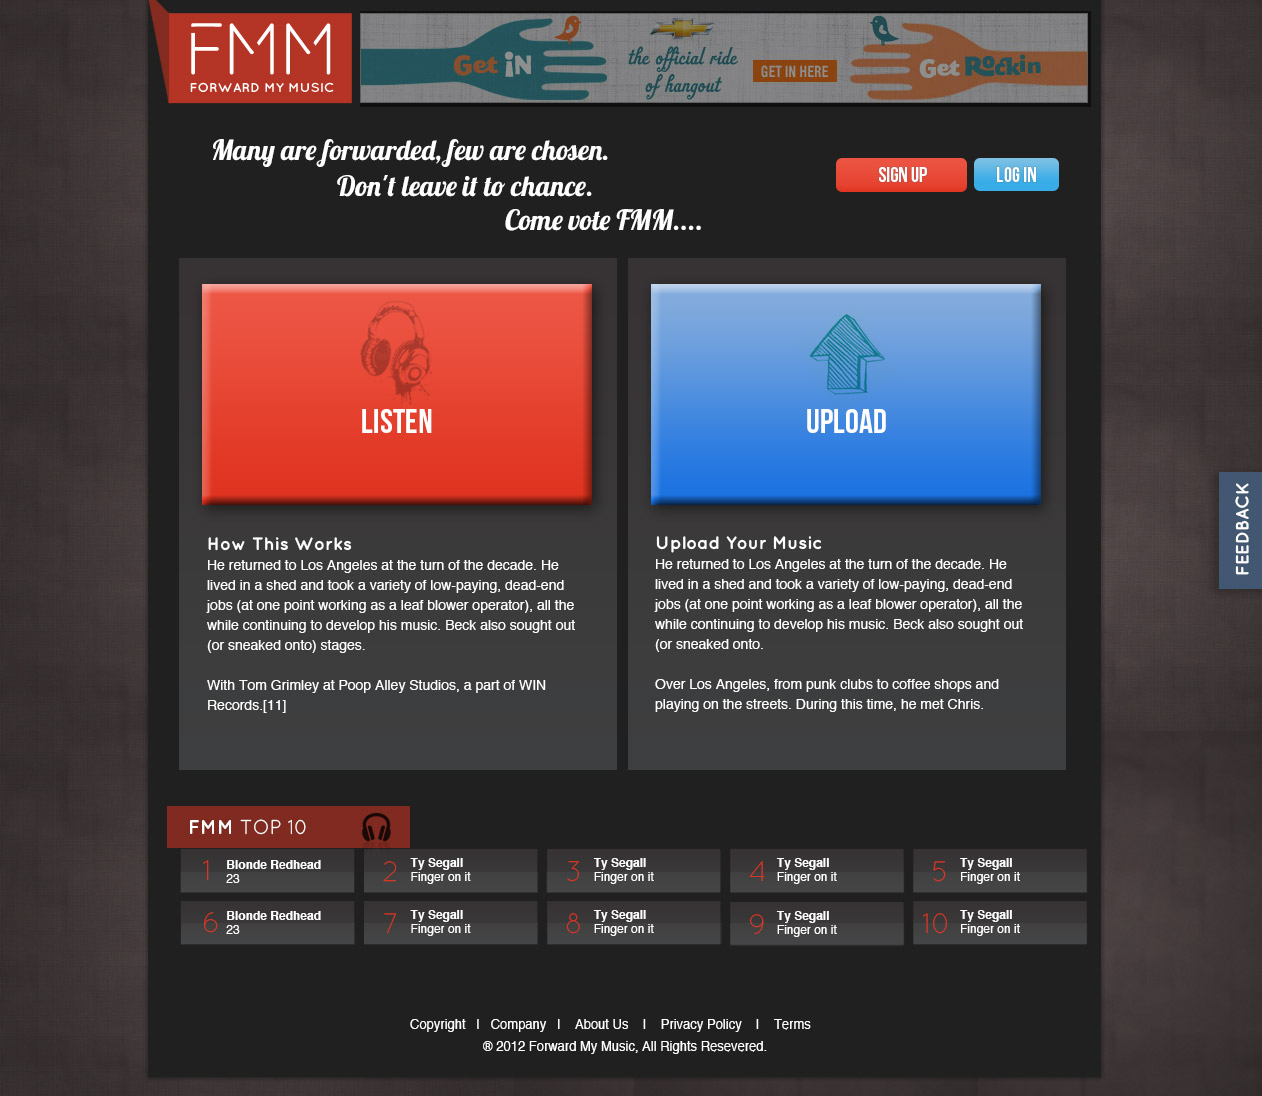 FMM_HomePage